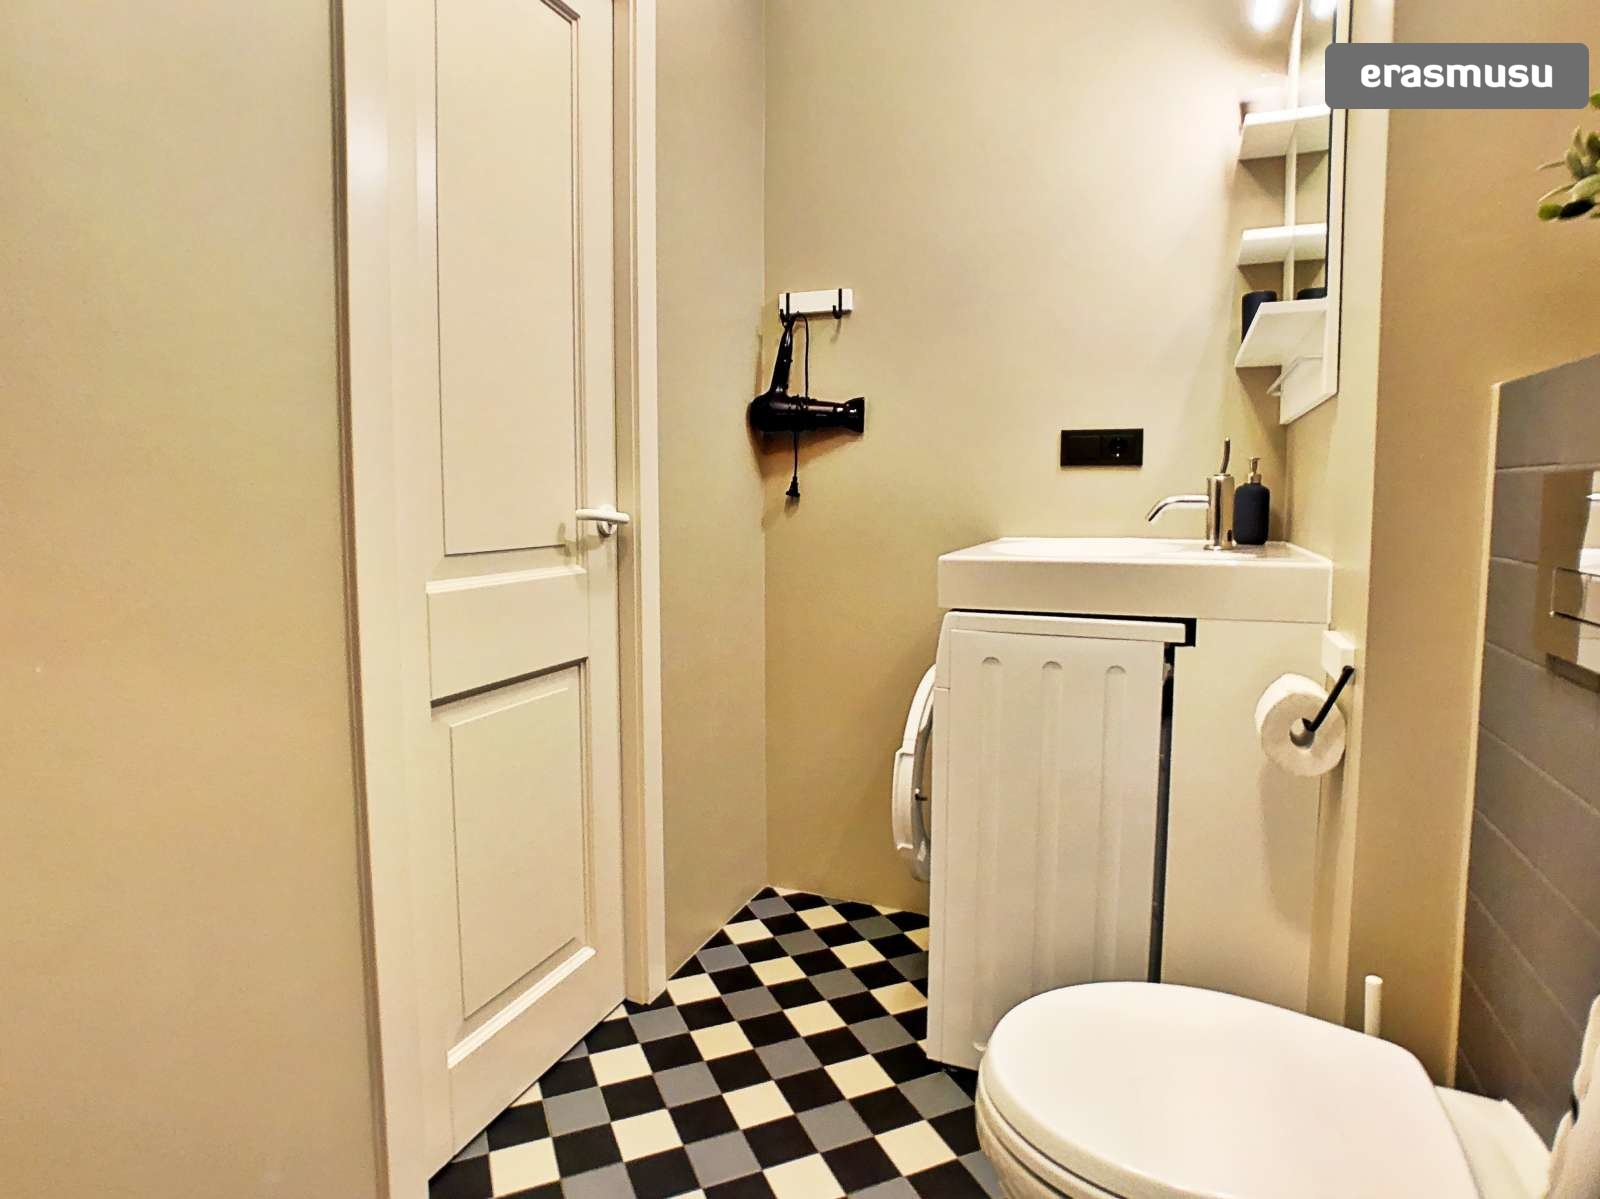 stylish-studio-apartment-rent-grizinkalns-4b7995e5fe37dbd469bec7